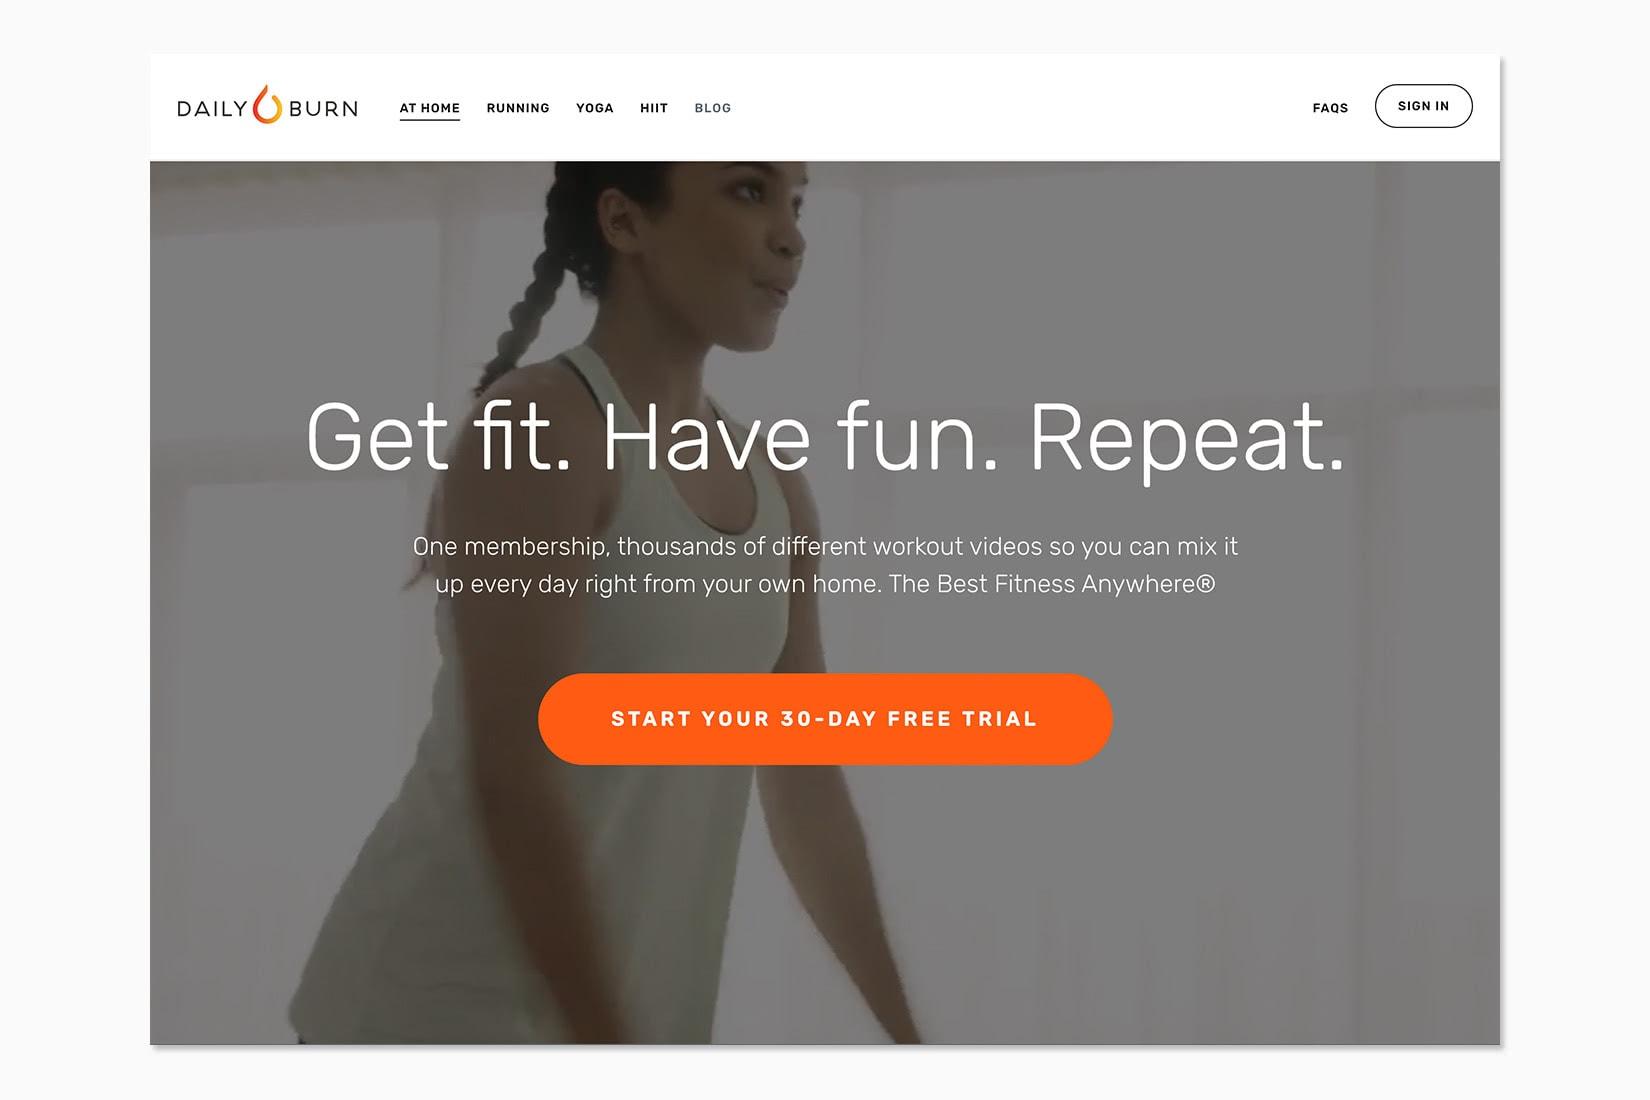 best online workout program dailyburn review - Luxe Digital